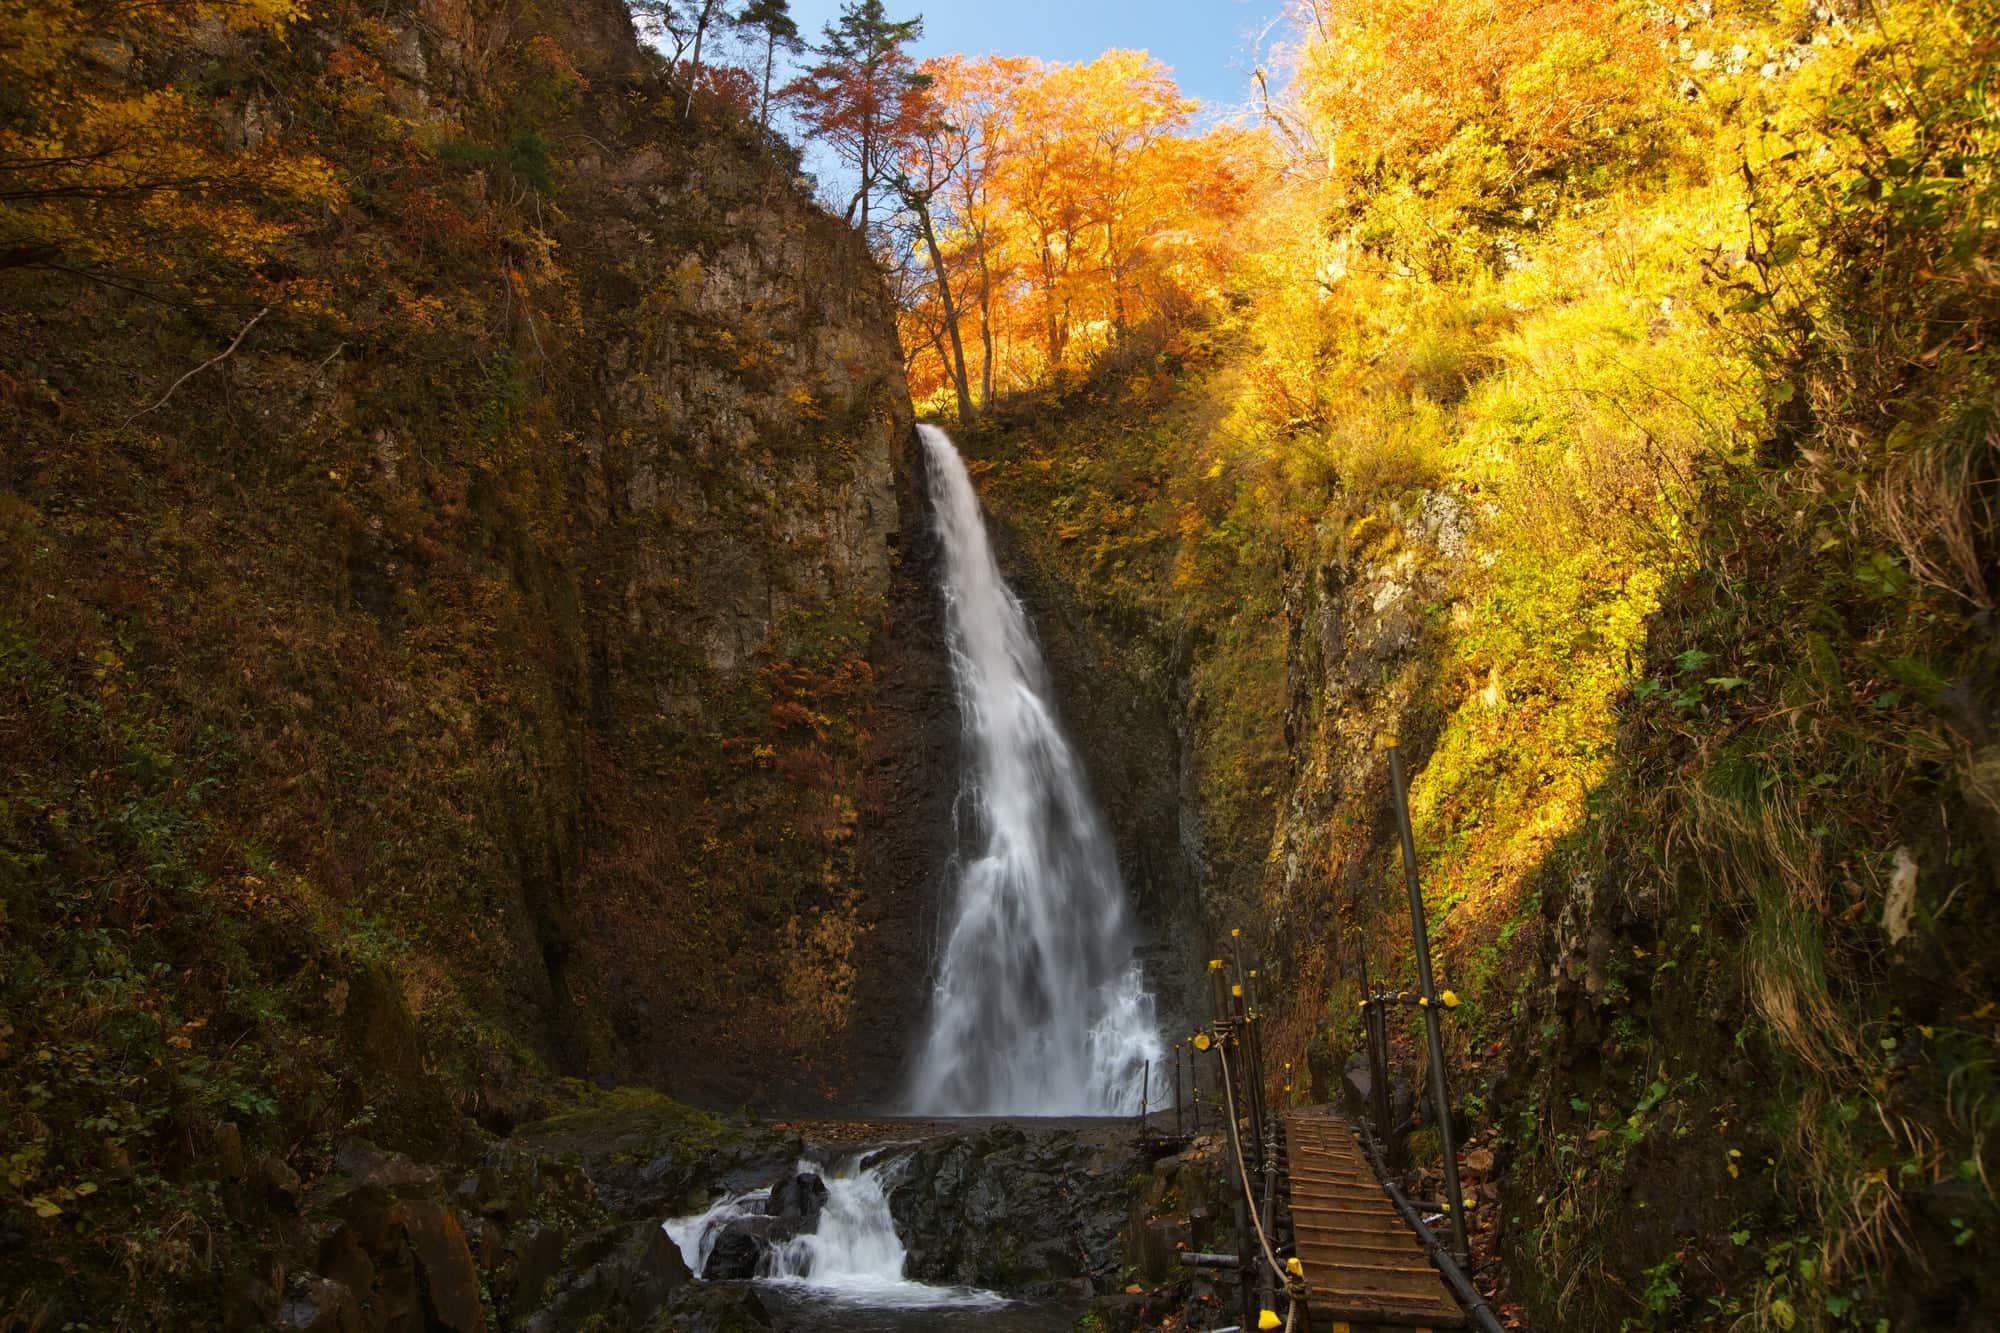 Anmon Falls in the autumn